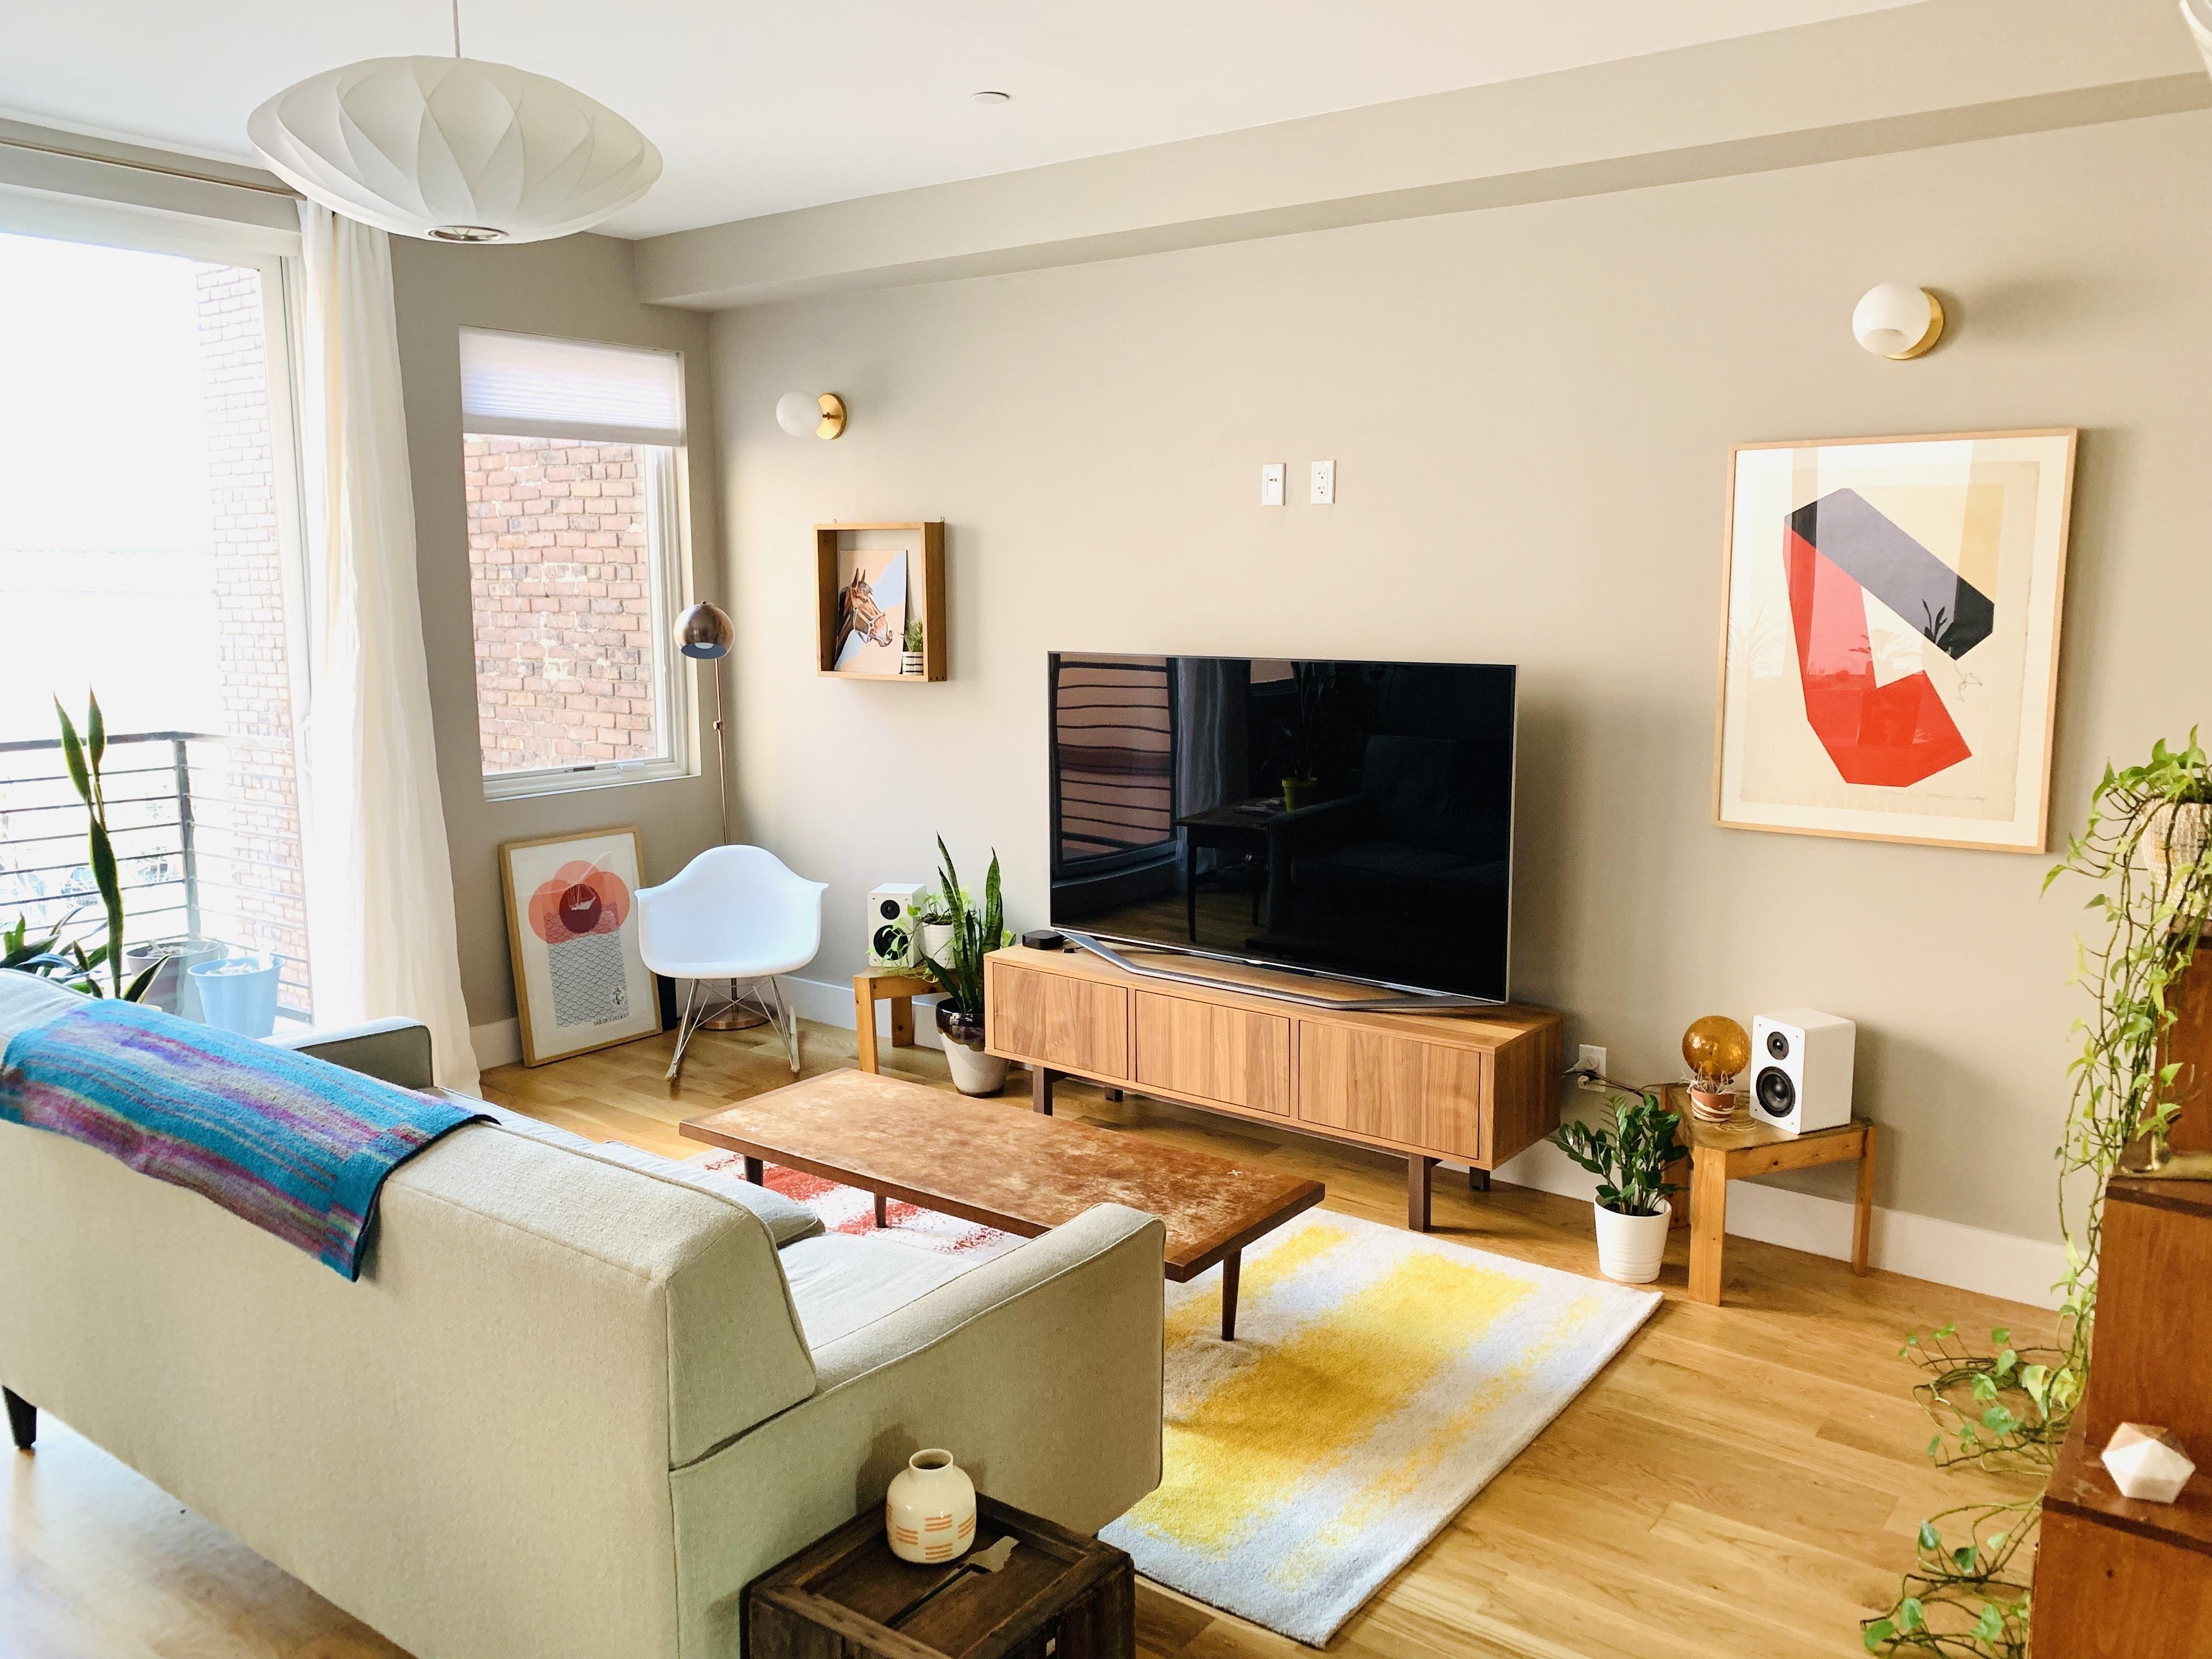 Living Room, Brooklyn NY : AmateurRoomPorn | Living room ...